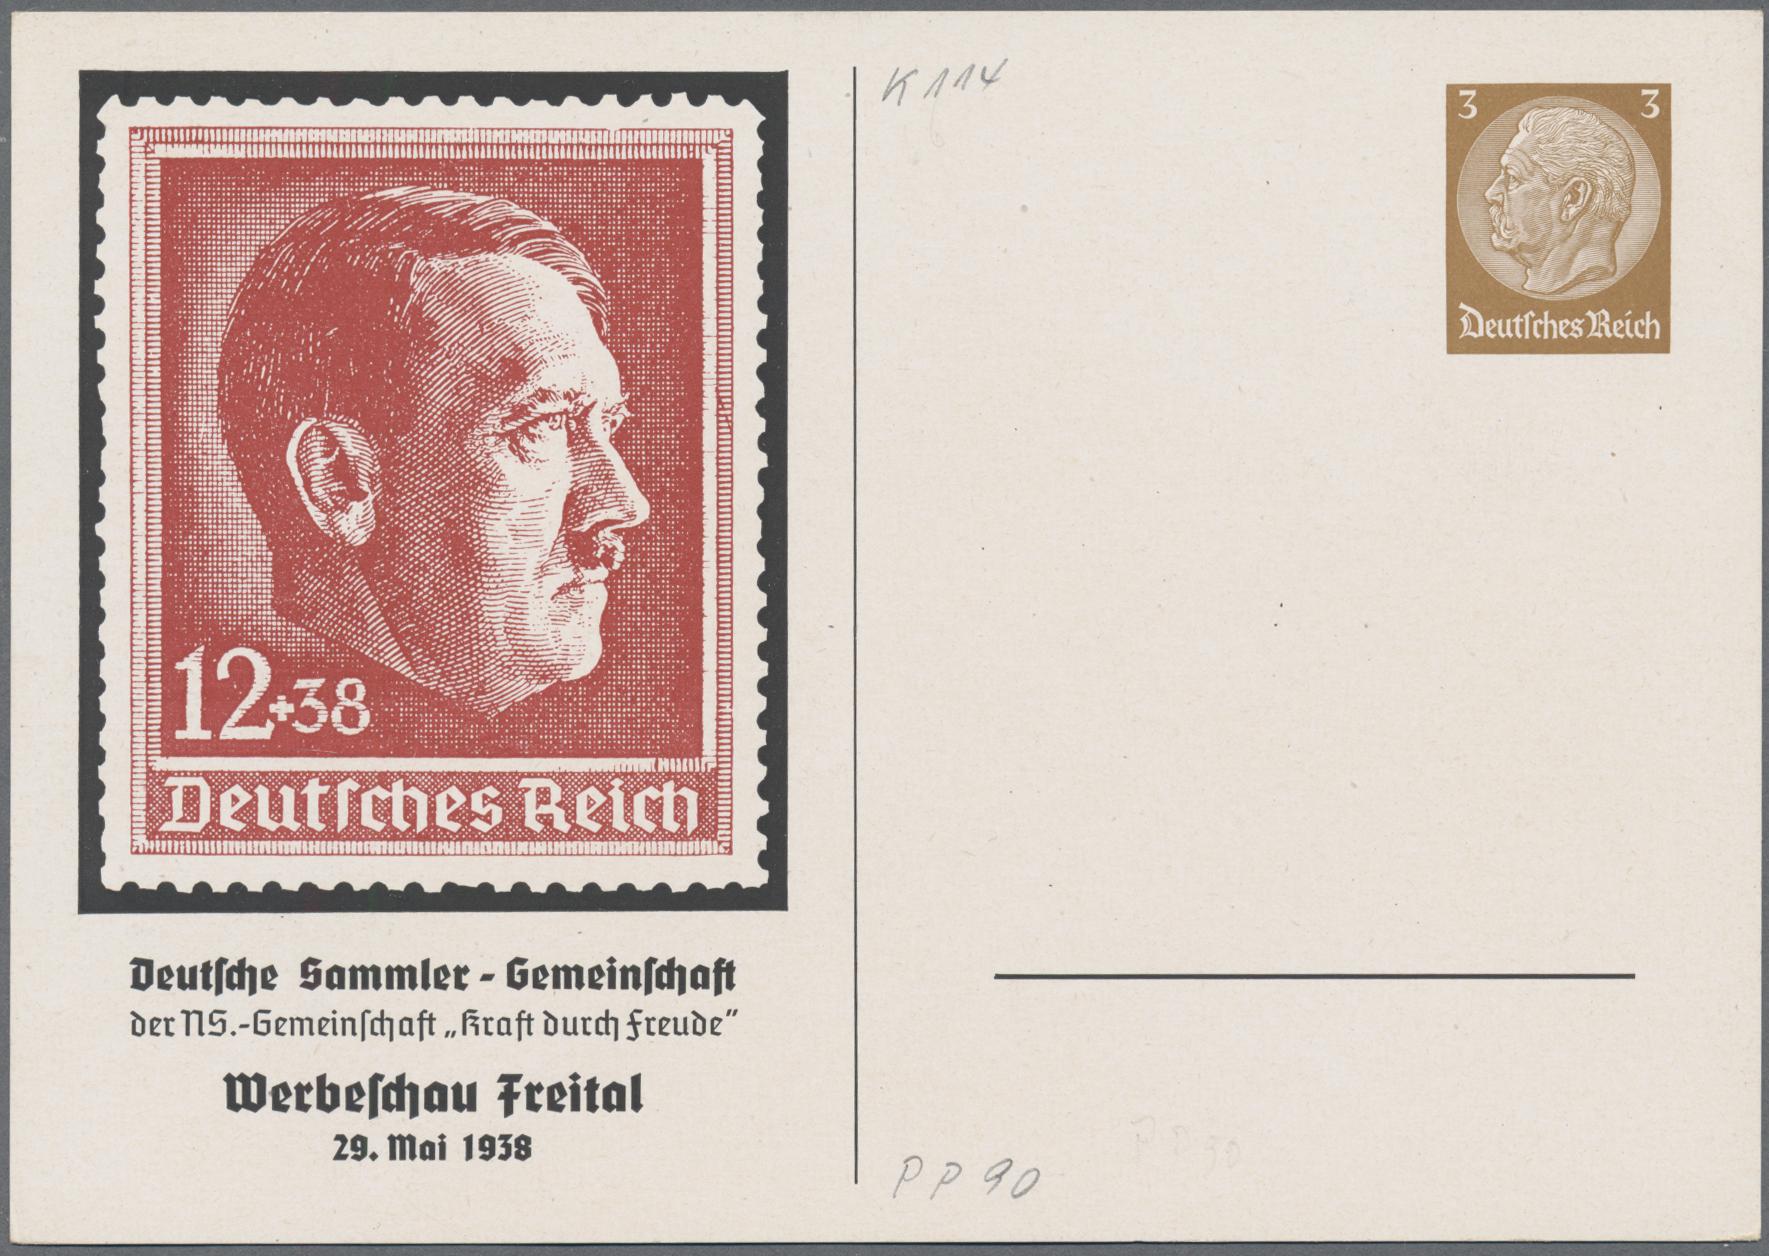 Lot 23546 - Deutsches Reich - Privatganzsachen  -  Auktionshaus Christoph Gärtner GmbH & Co. KG Sale #49 Collections Overseas, Thematics, Europe, Germany/Estates